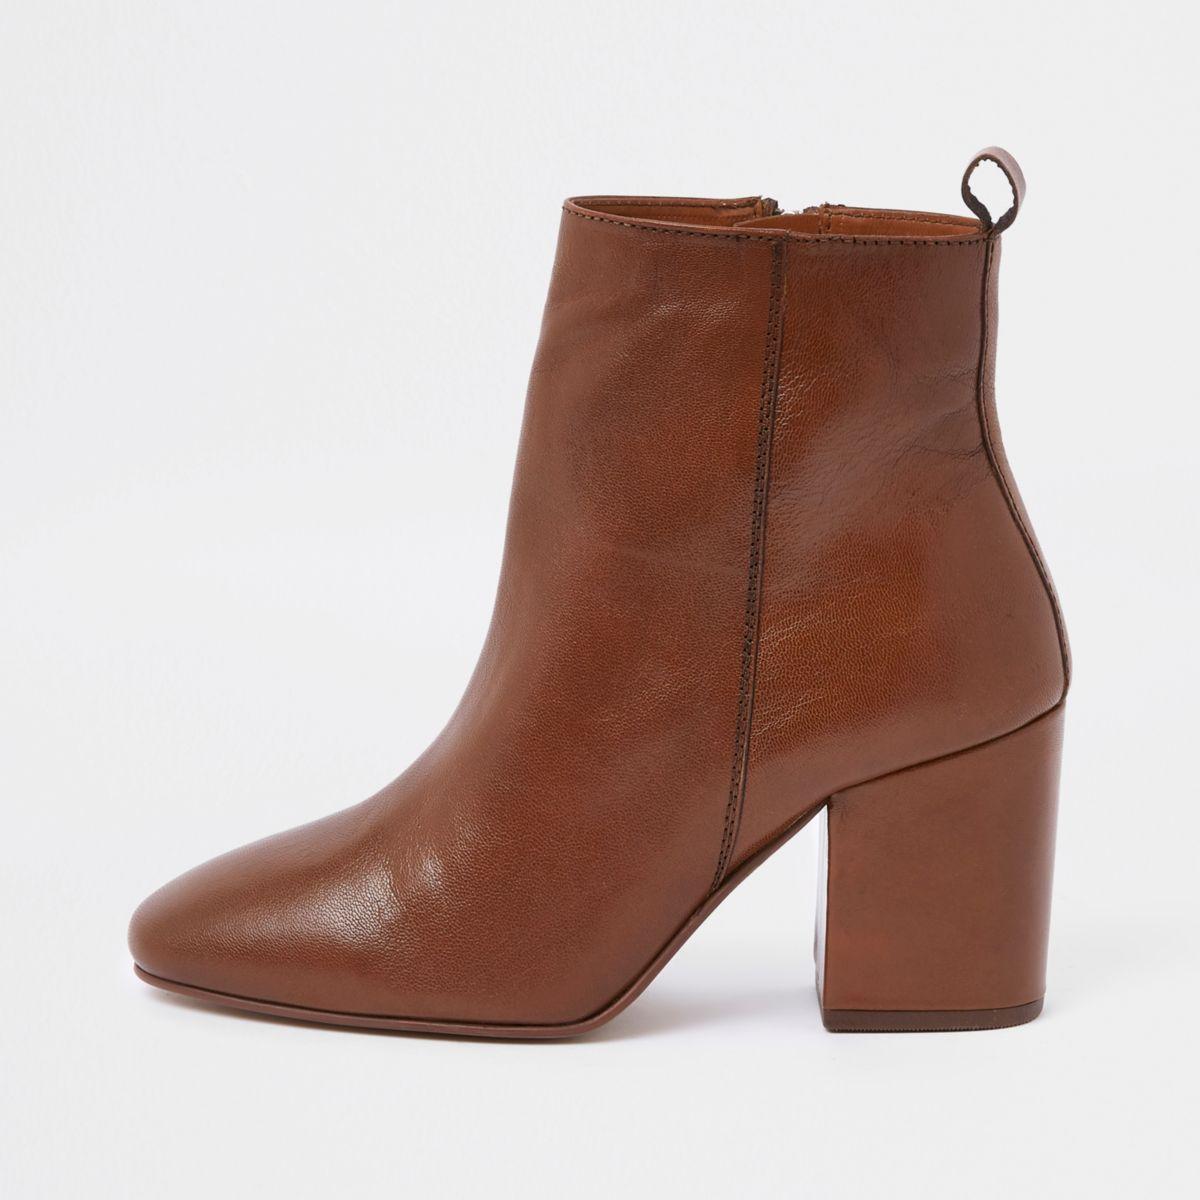 Light brown block heel ankle boots